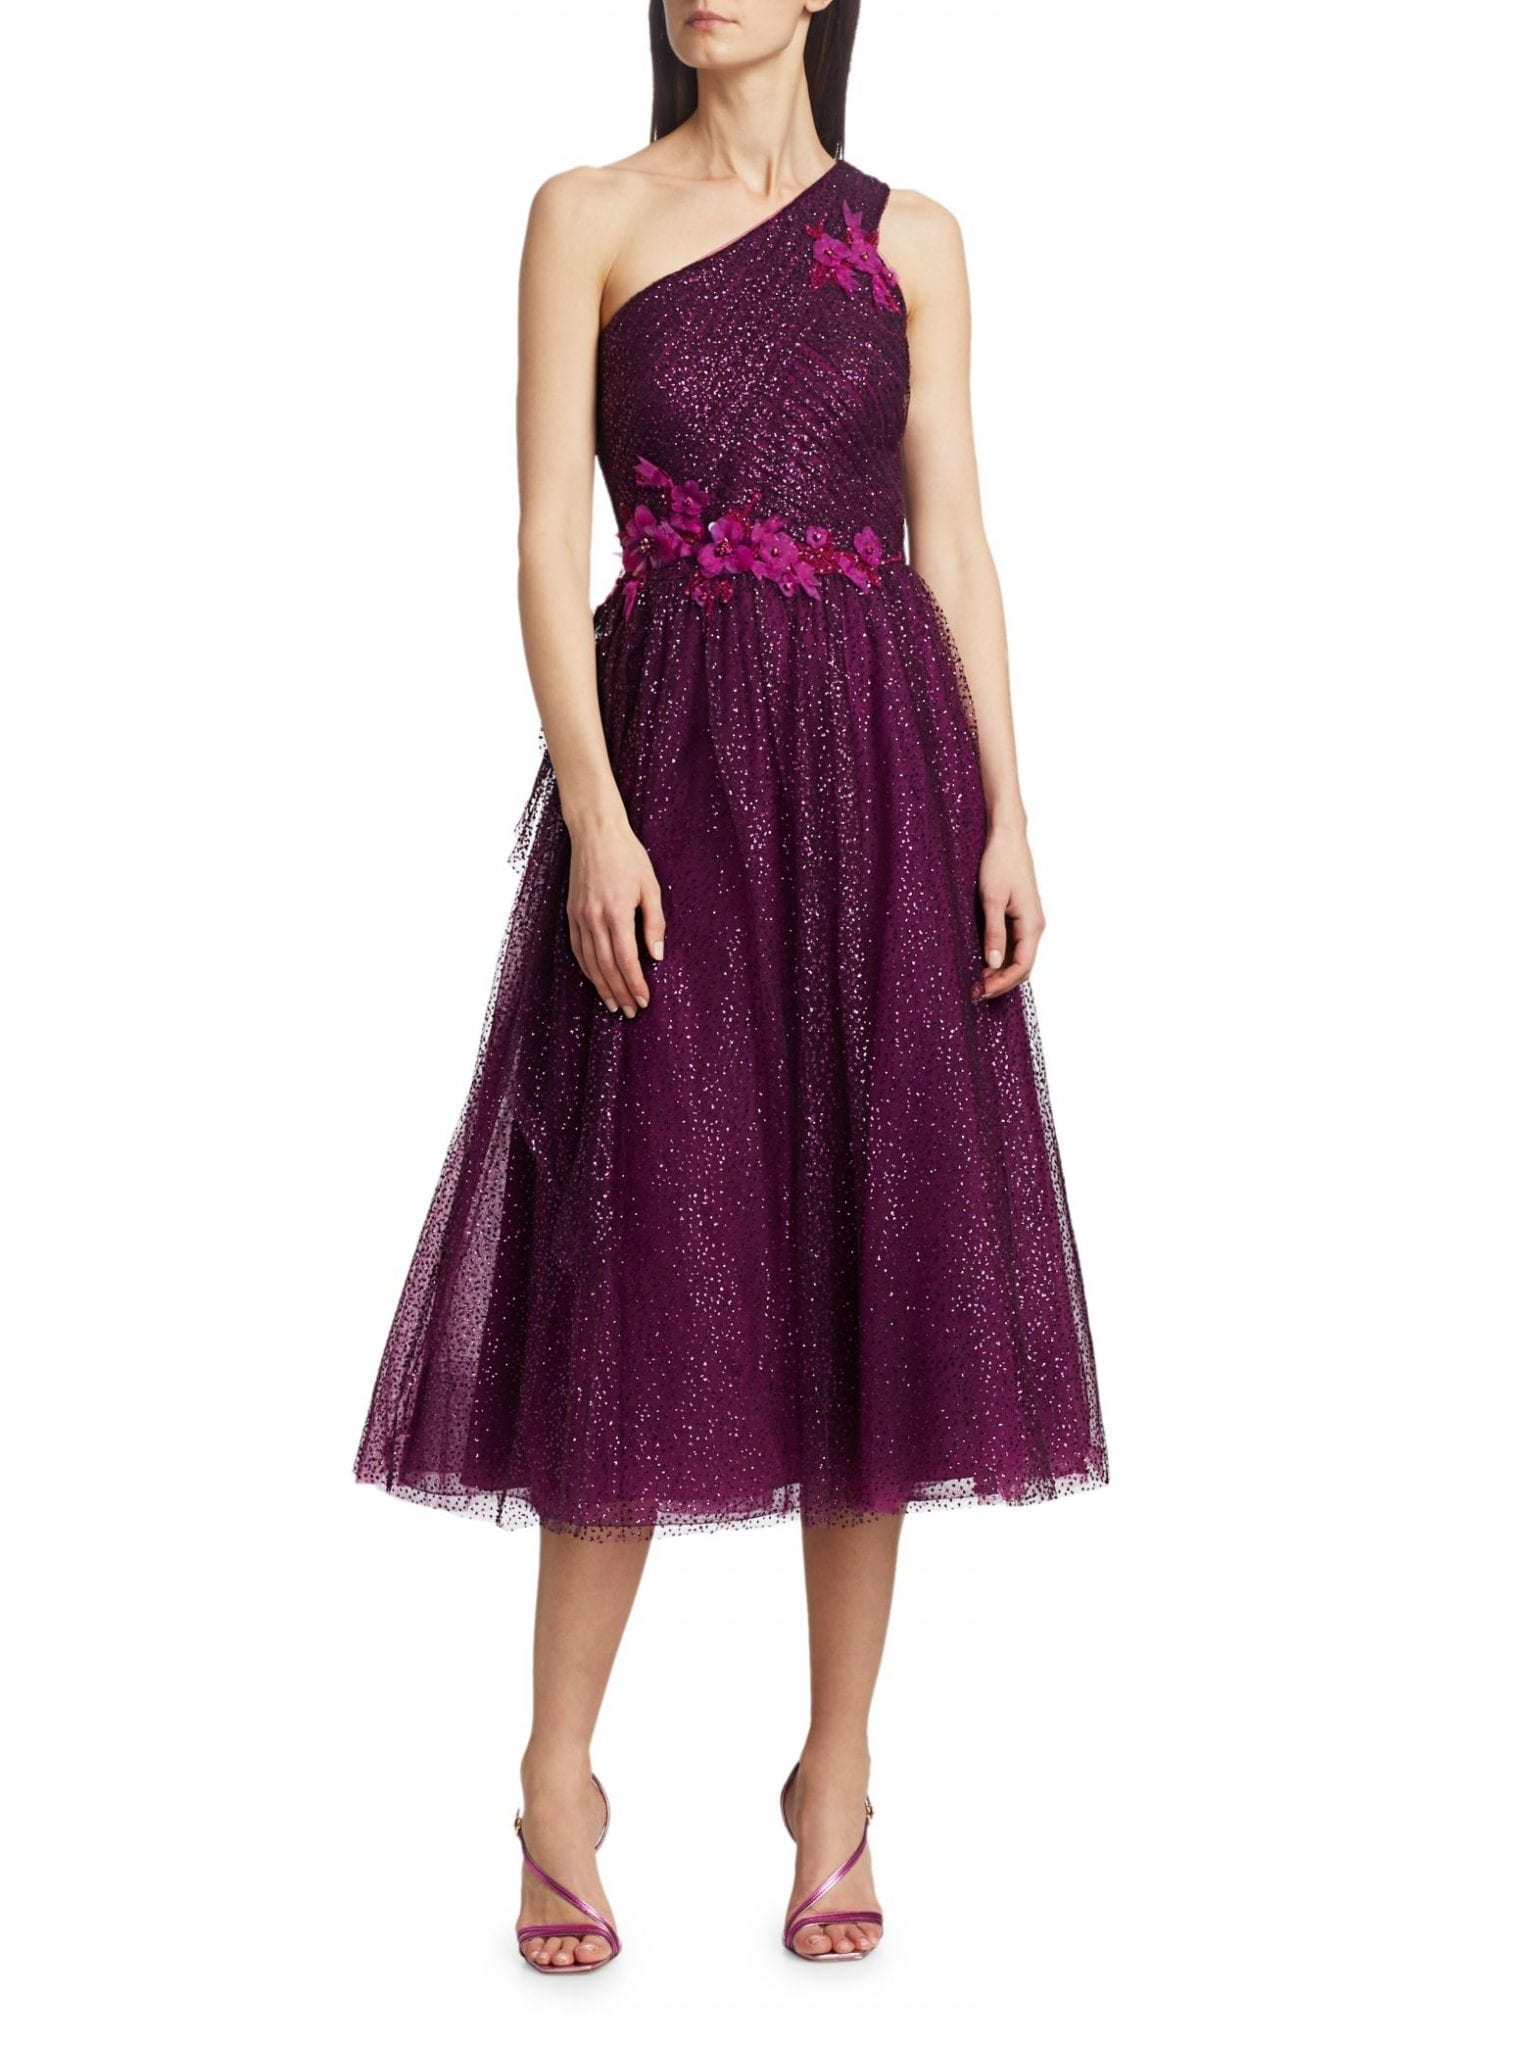 MARCHESA NOTTE Glitter Tulle One-Shoulder Dress